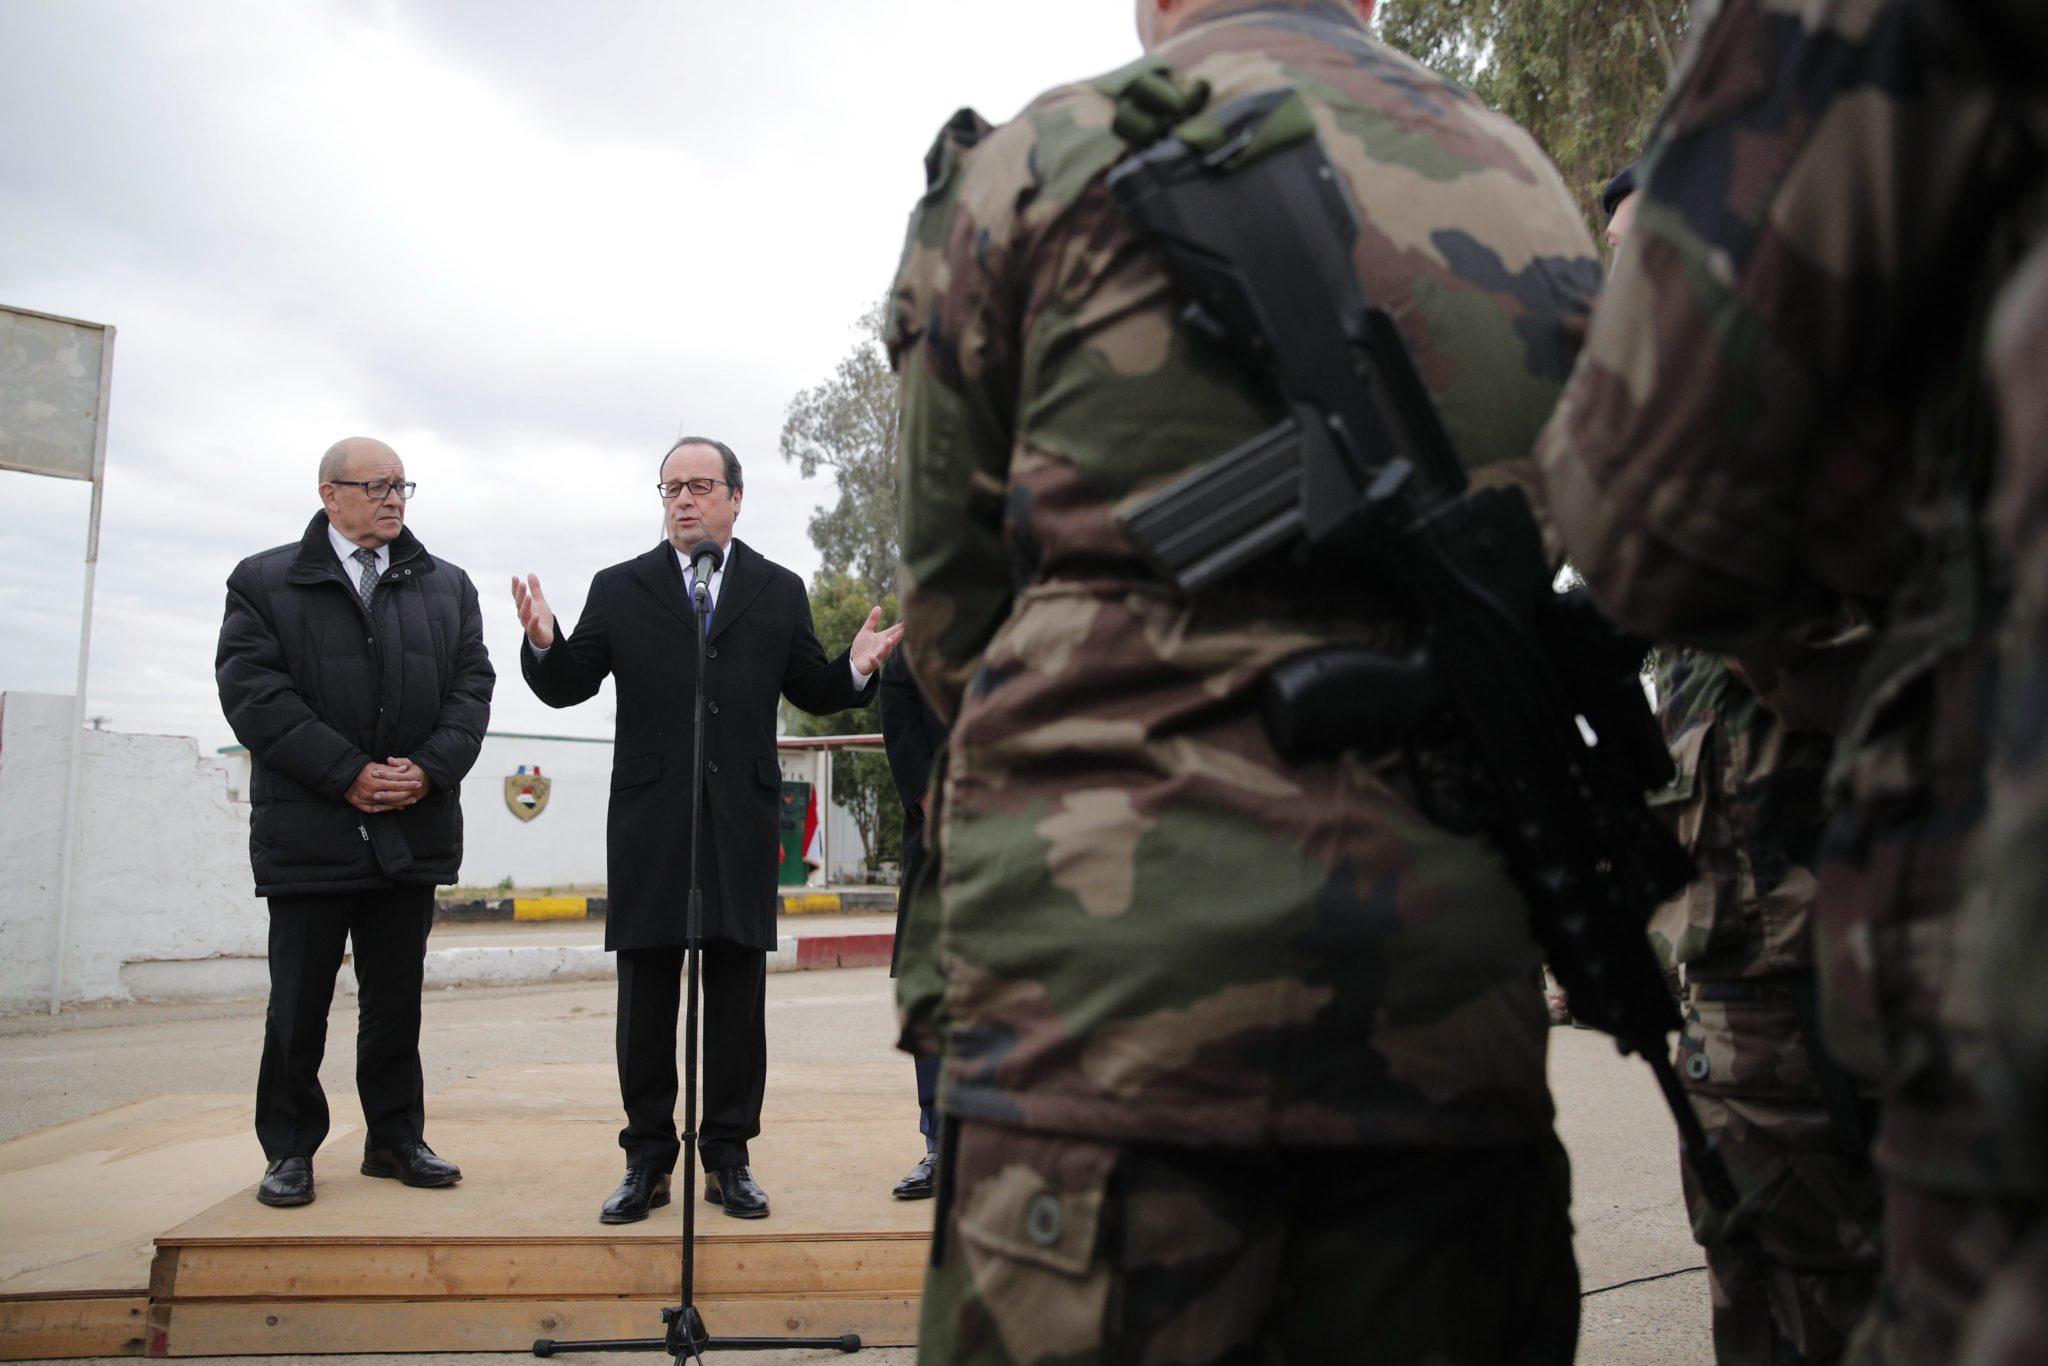 Irak: wizyta prezydenta Francji Francoisa Hollande w Iraku (foto. PAP/EPA/CHRISTOPHE)